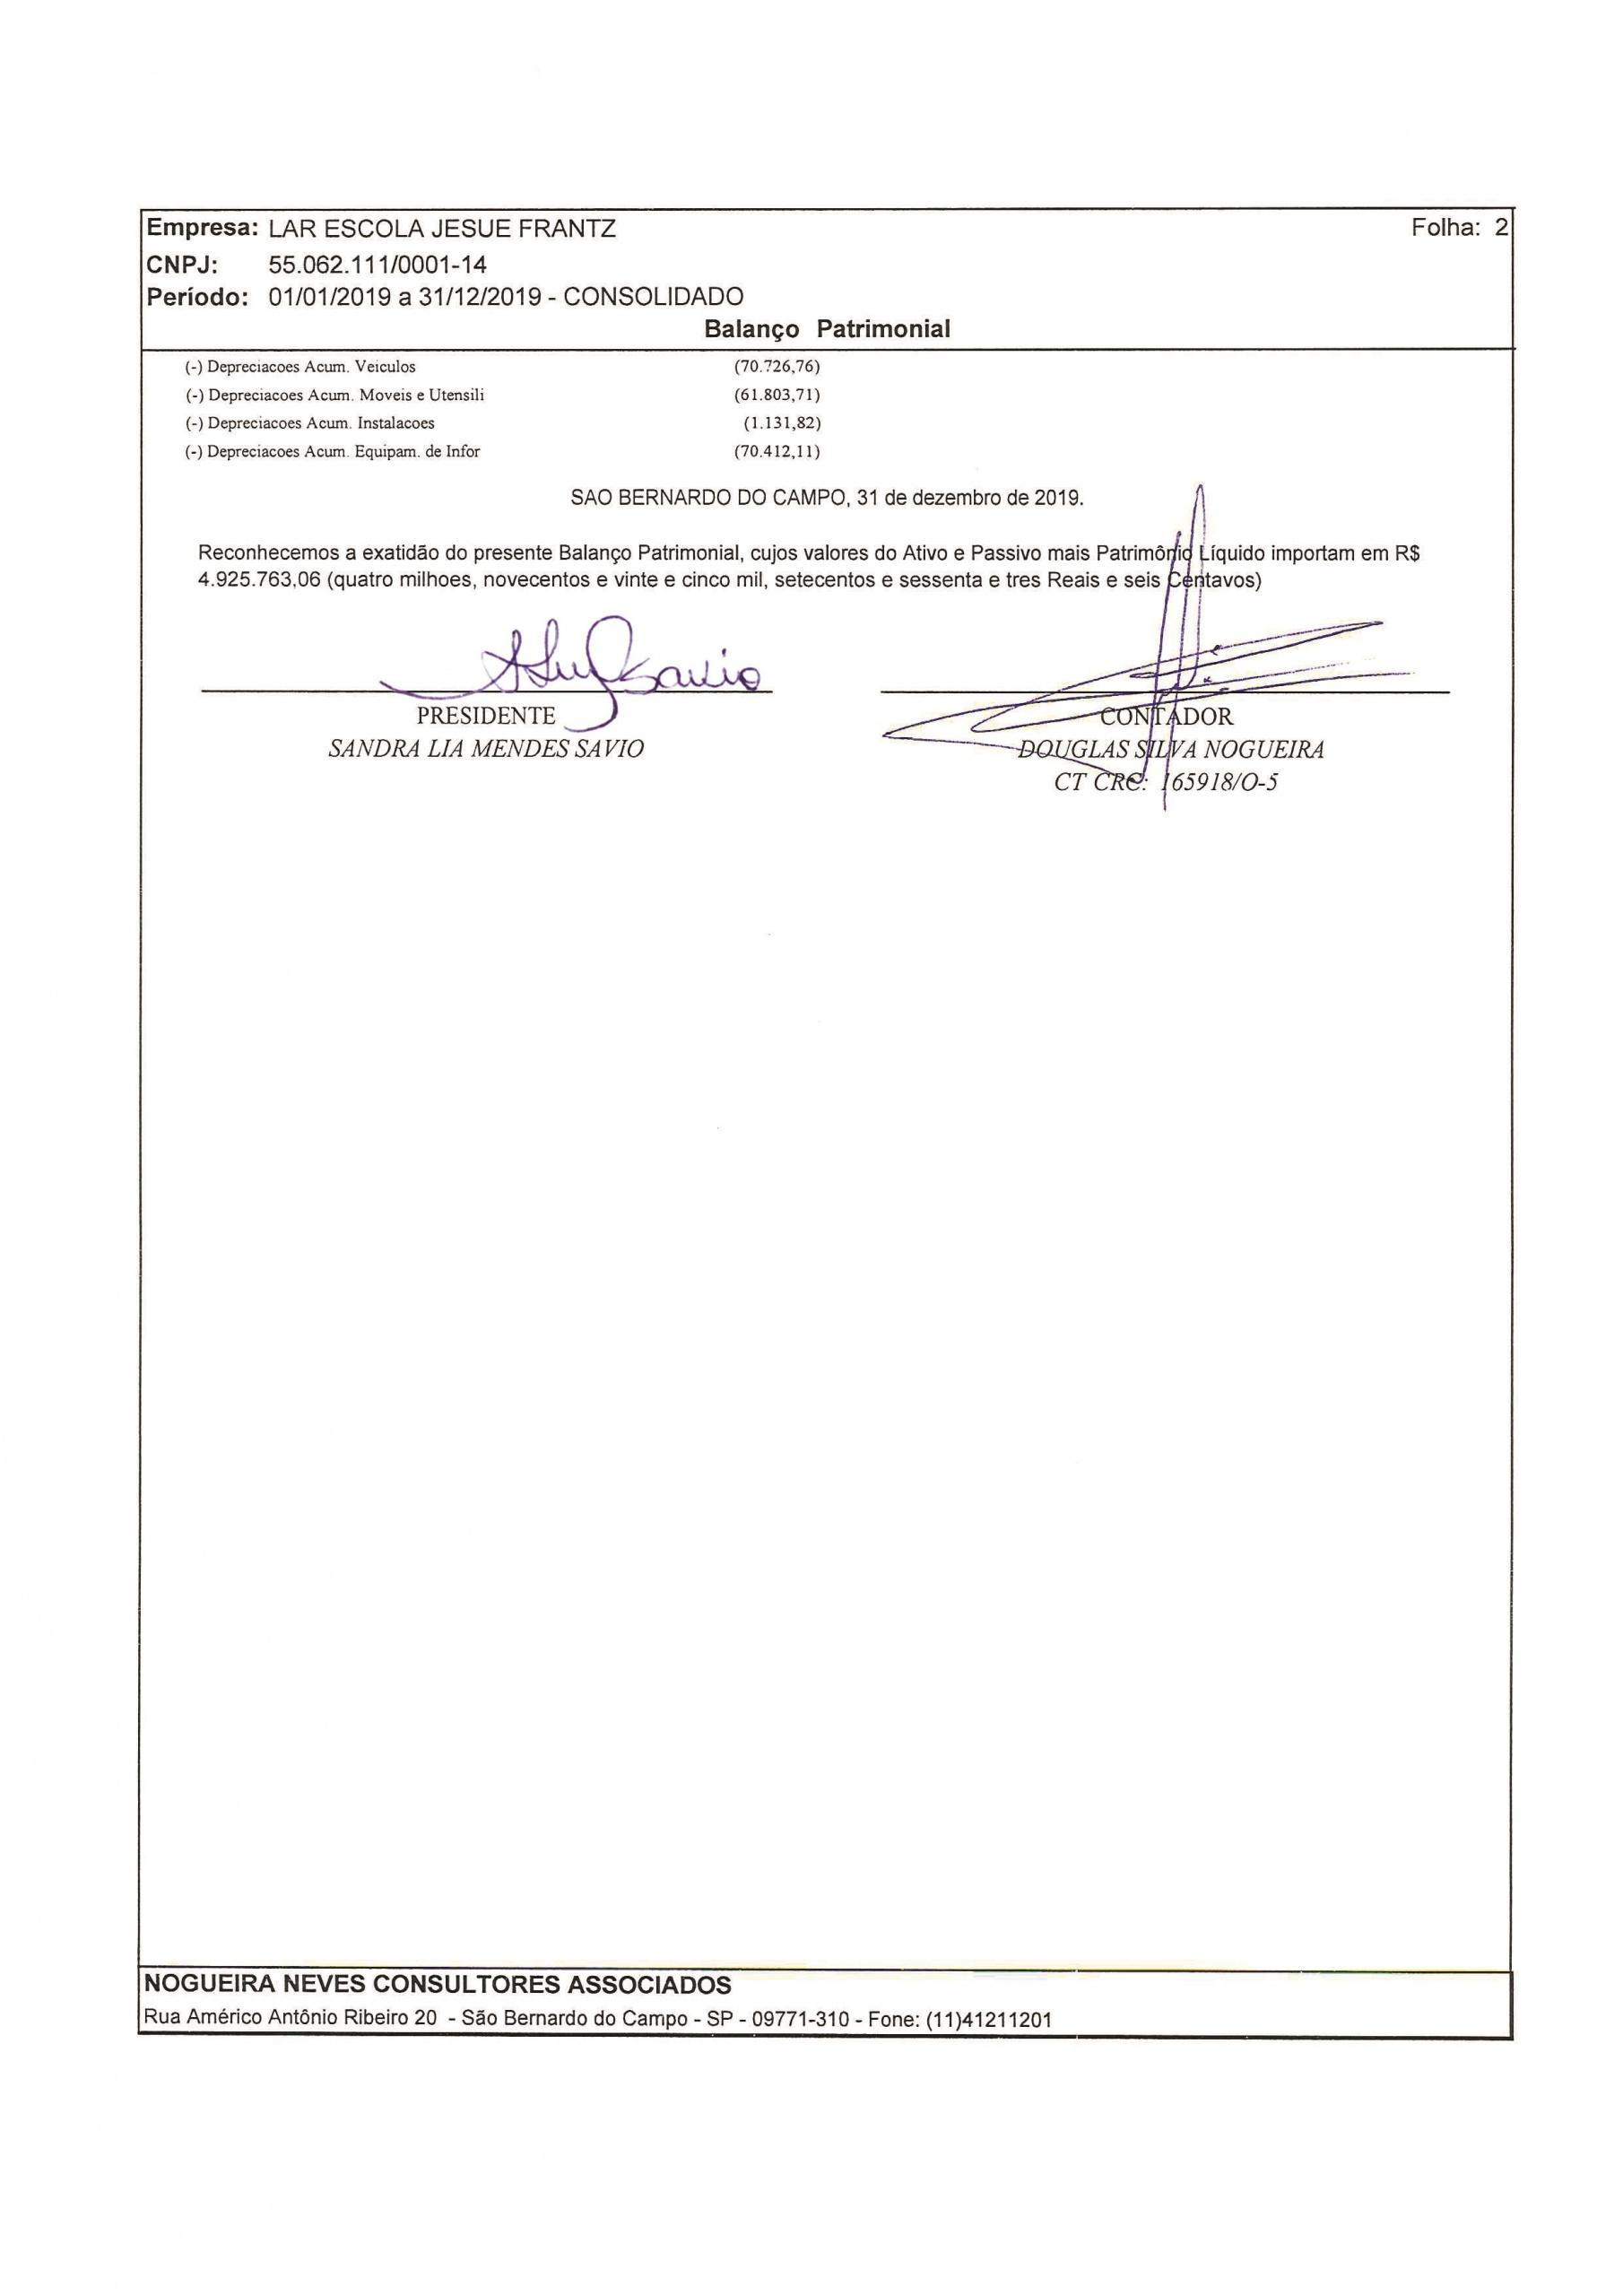 Balanço-Patrimonial_Lar-Escola1_2019_Page_2-1